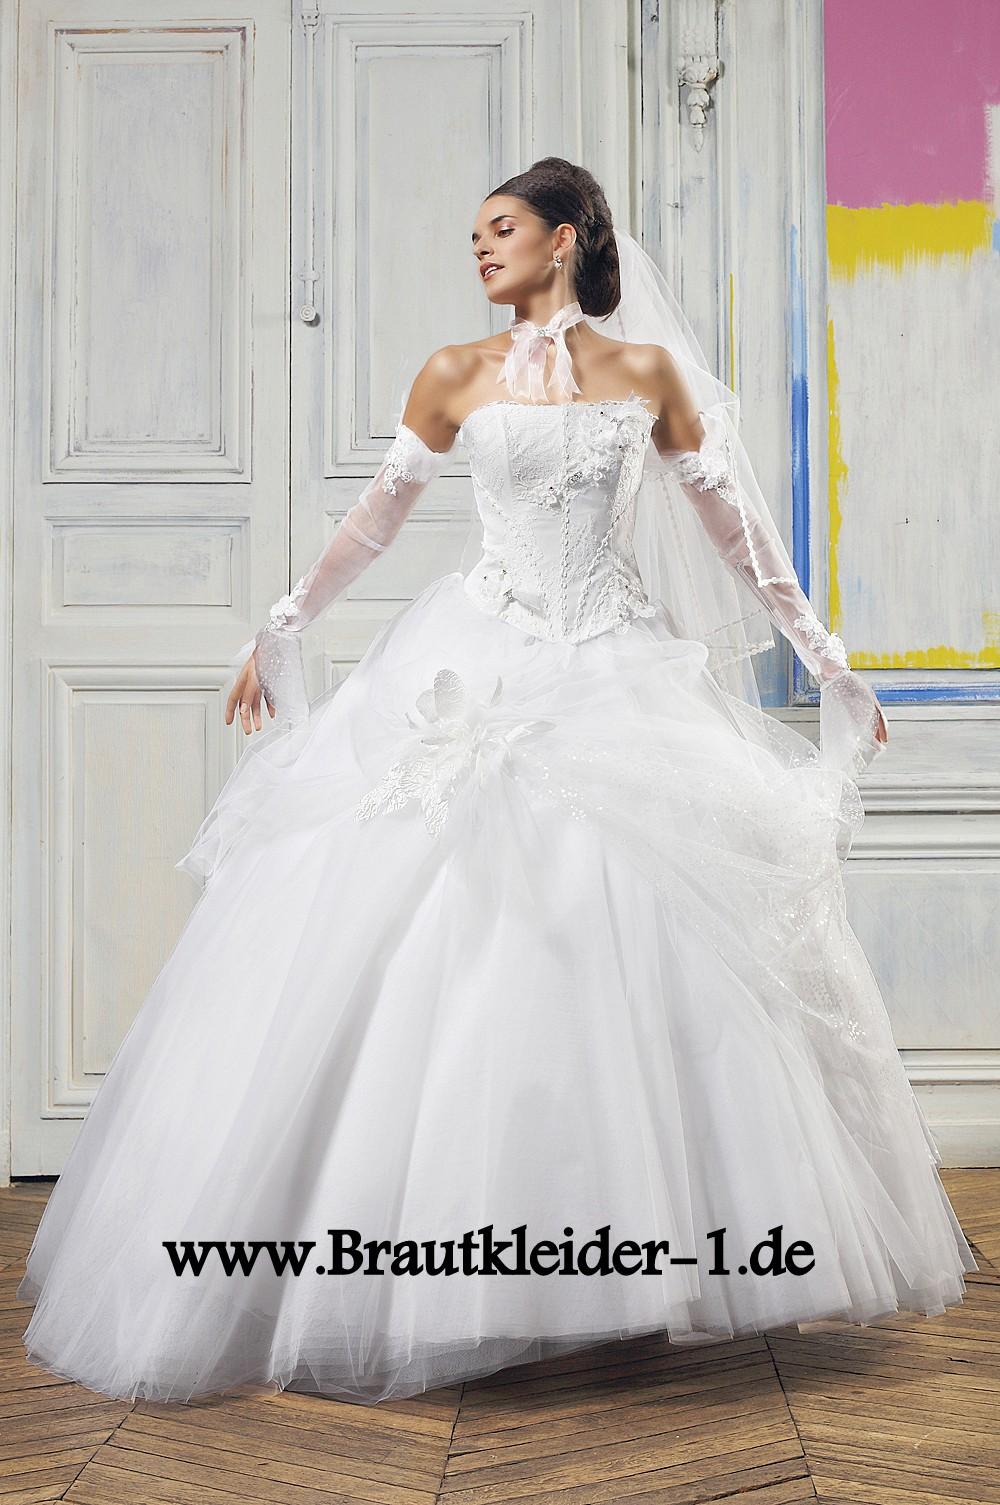 Brautkleid Alberta #braut #brautkleid #wedding #mode #damenmode